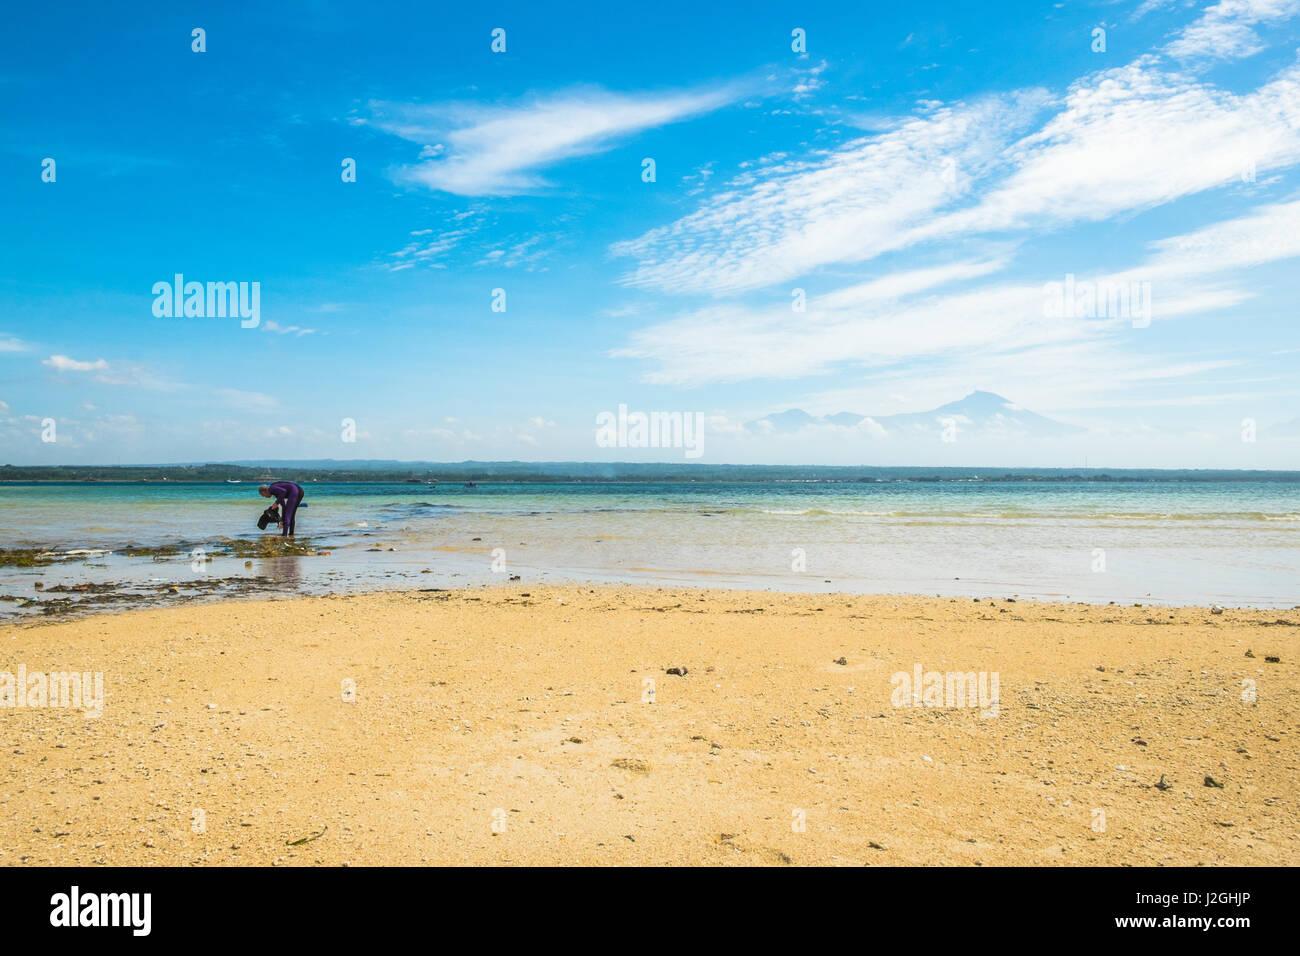 Islas exóticas tropicales en Lombok, Indonesia. Imagen De Stock